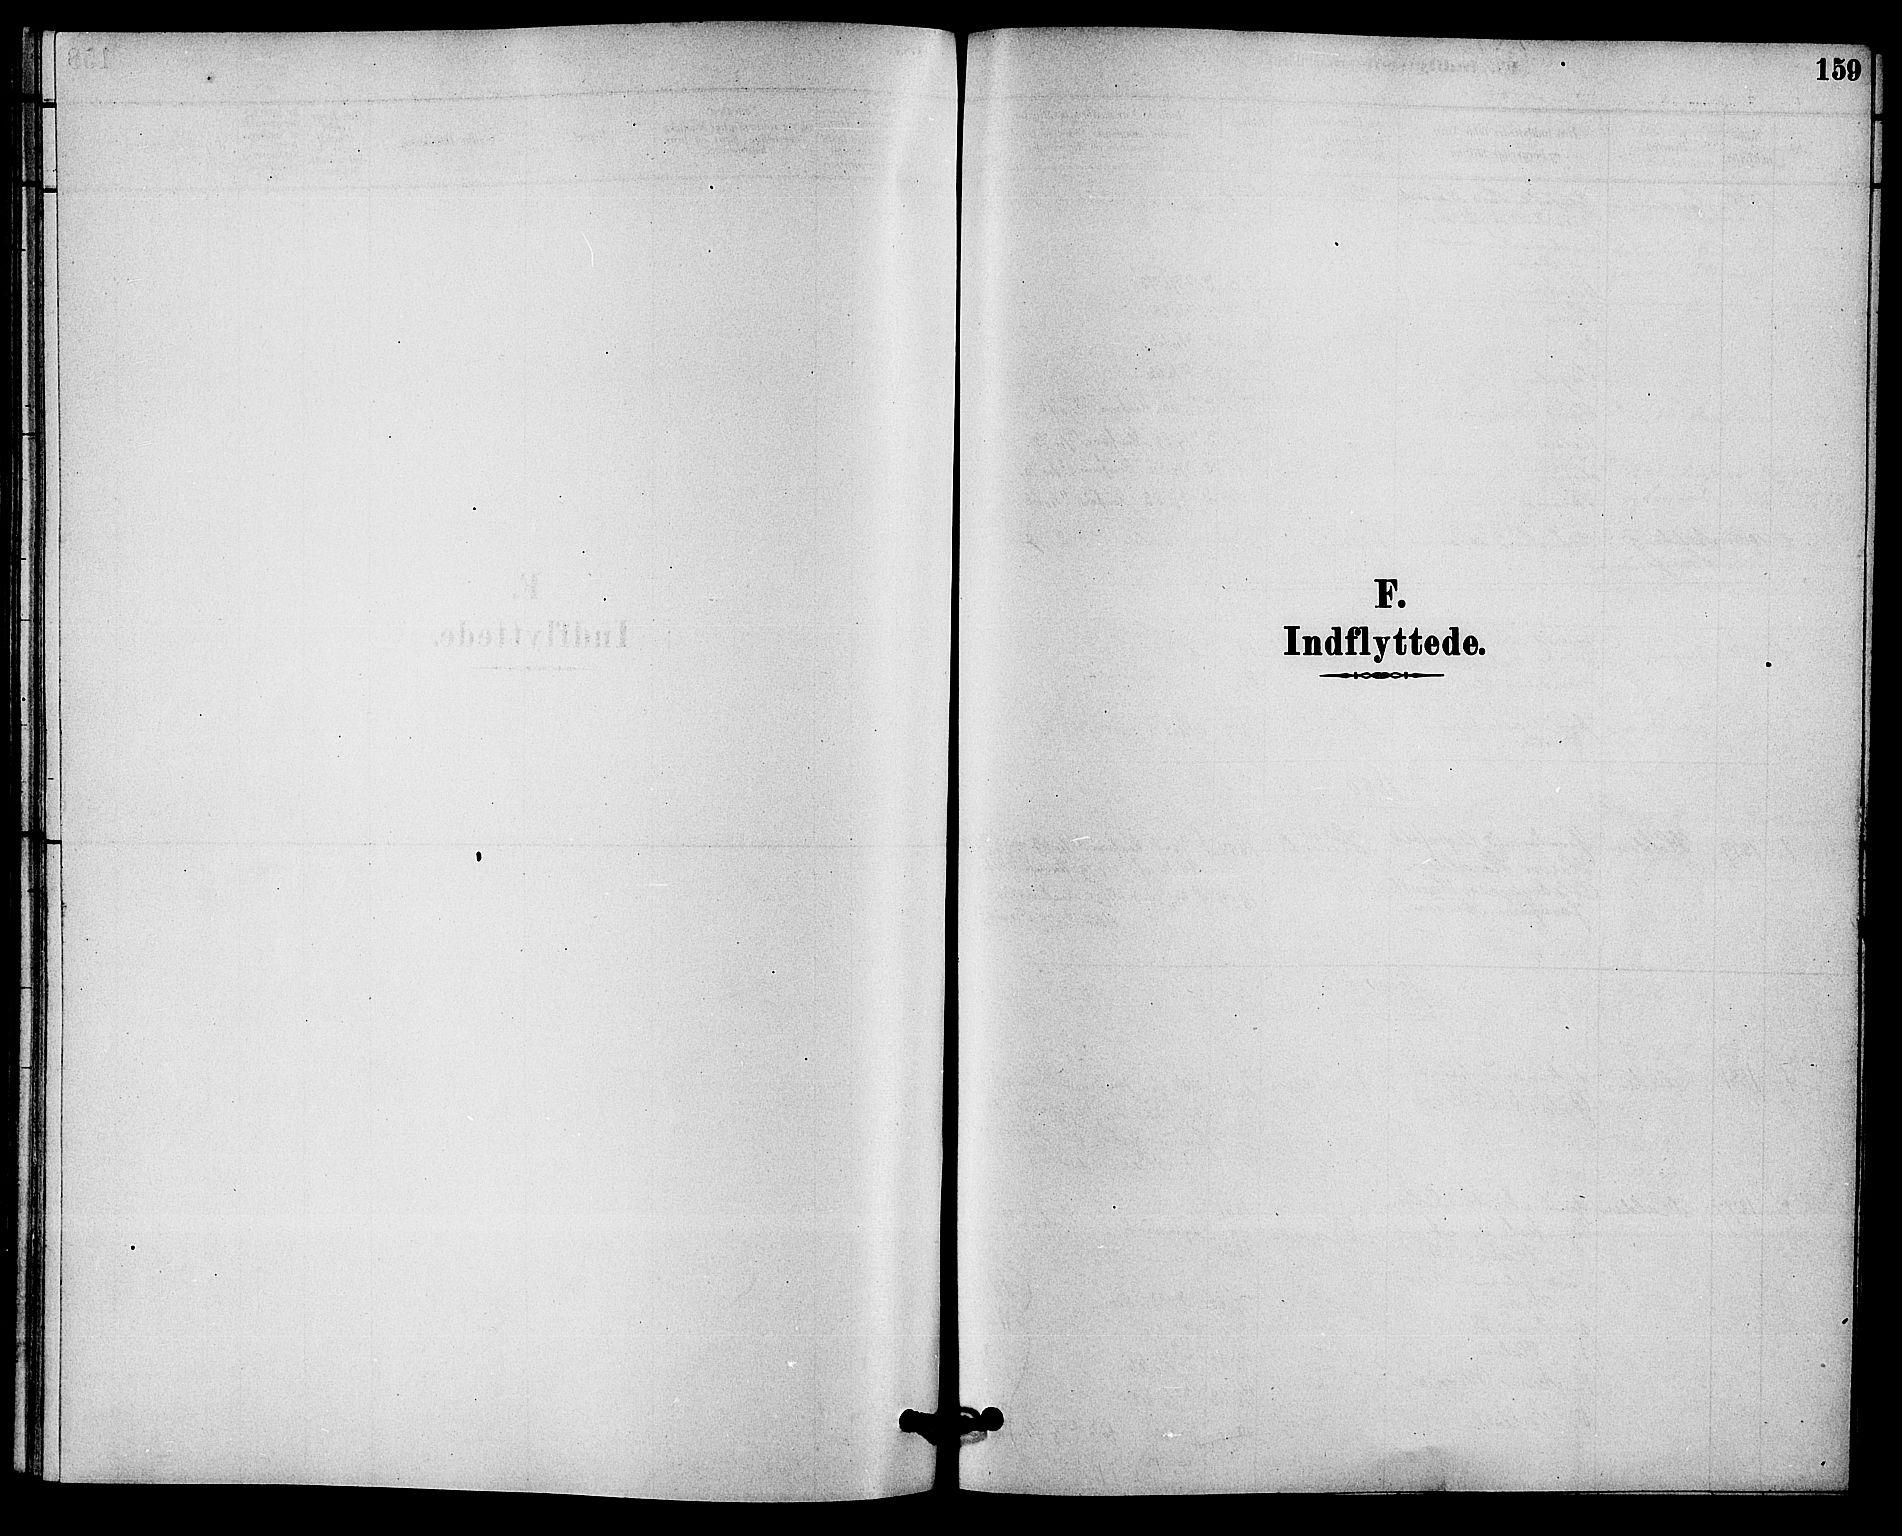 SAKO, Solum kirkebøker, F/Fb/L0001: Ministerialbok nr. II 1, 1877-1892, s. 159